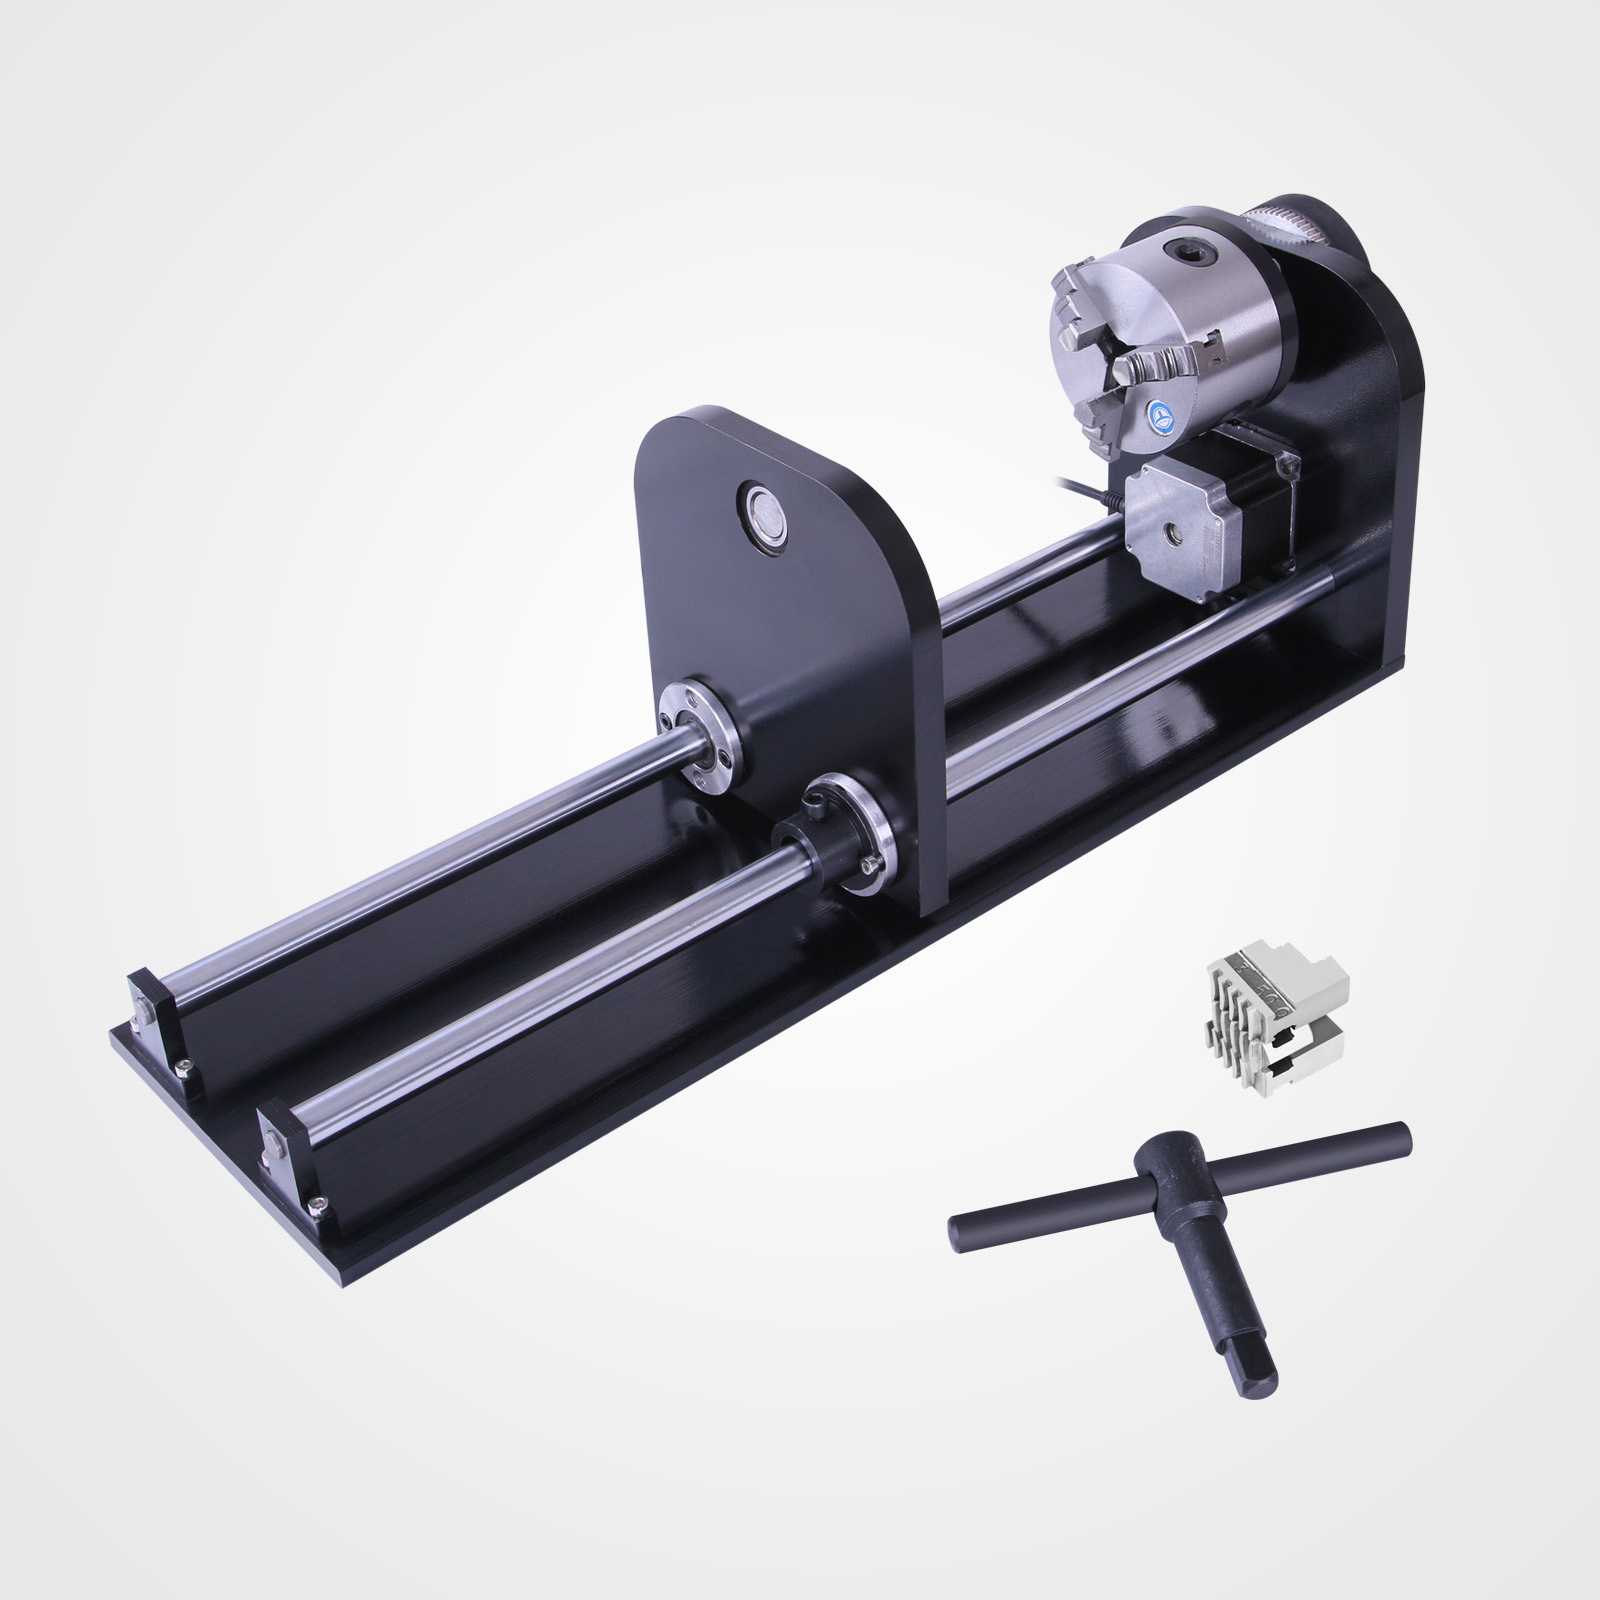 Macchina-per-Incisione-Laser-CO2-40-130W-Asse-Rotante-Tagliatrice-Incisore miniatura 92